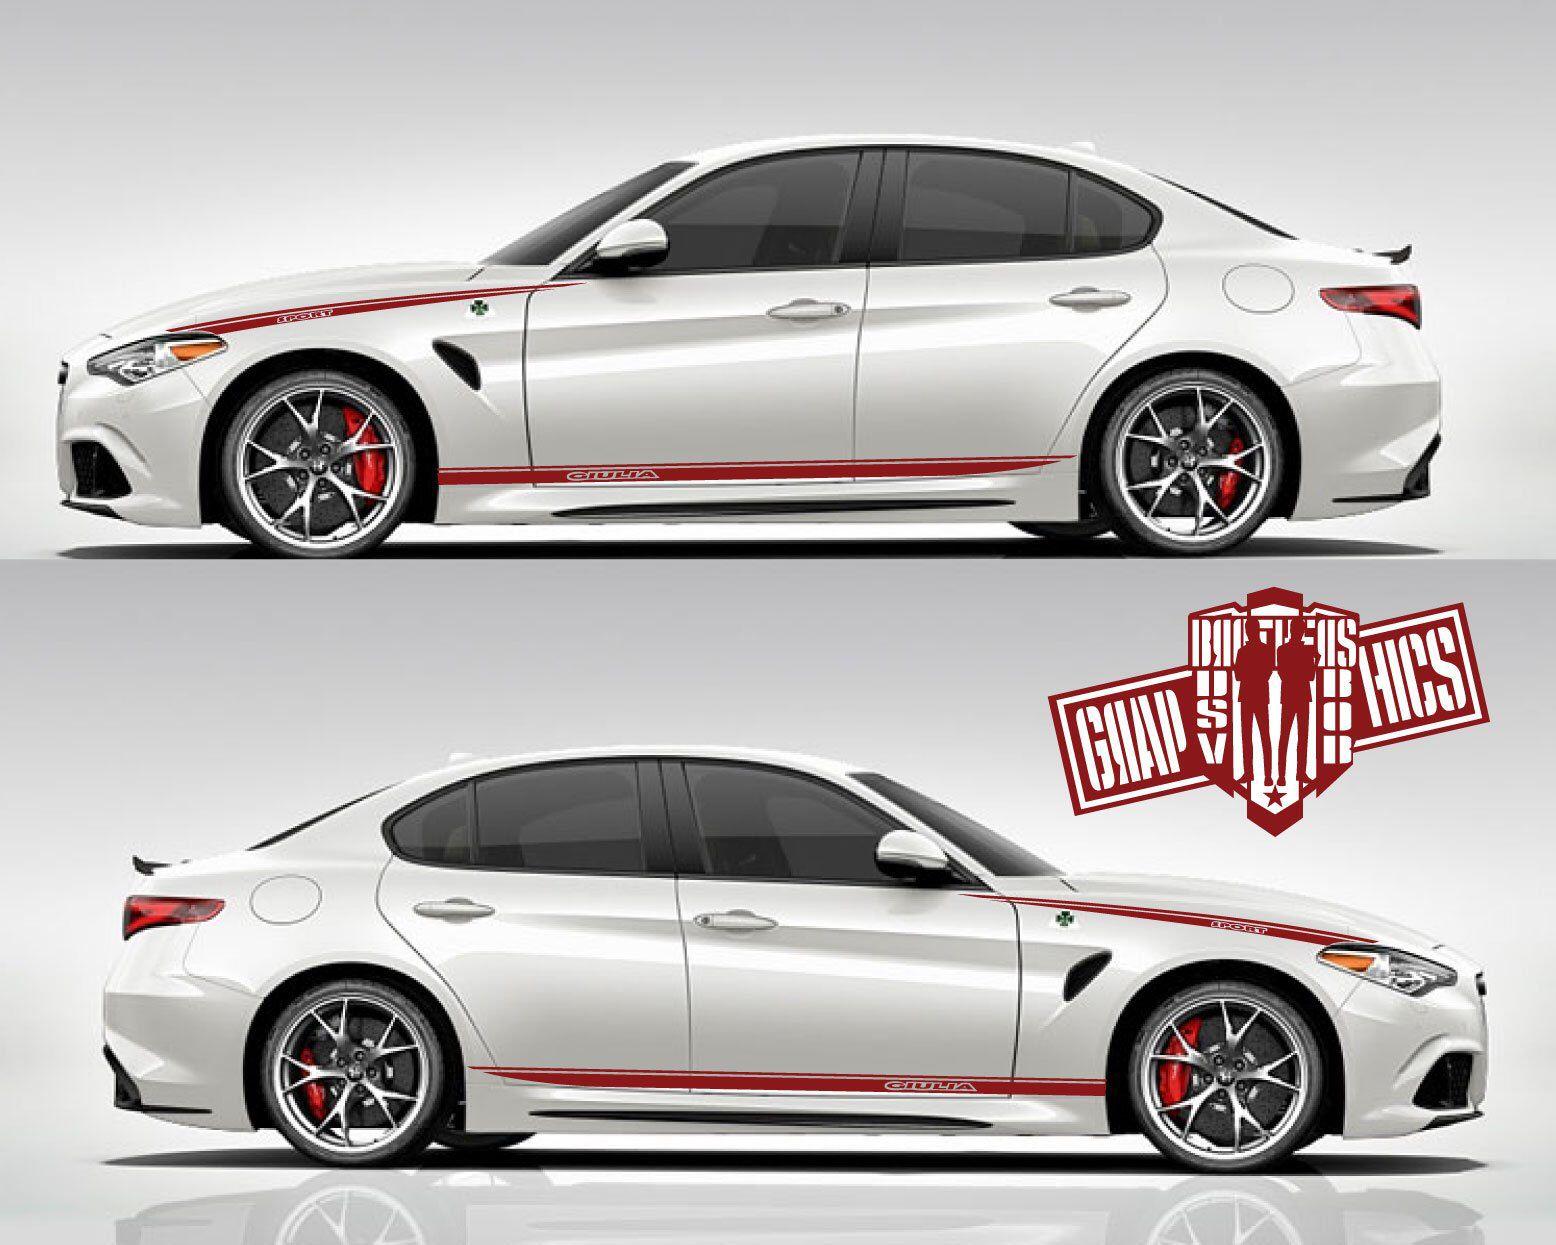 ALFA ROMEO GIULIA 4x Racing Stripes graphics vinyl body